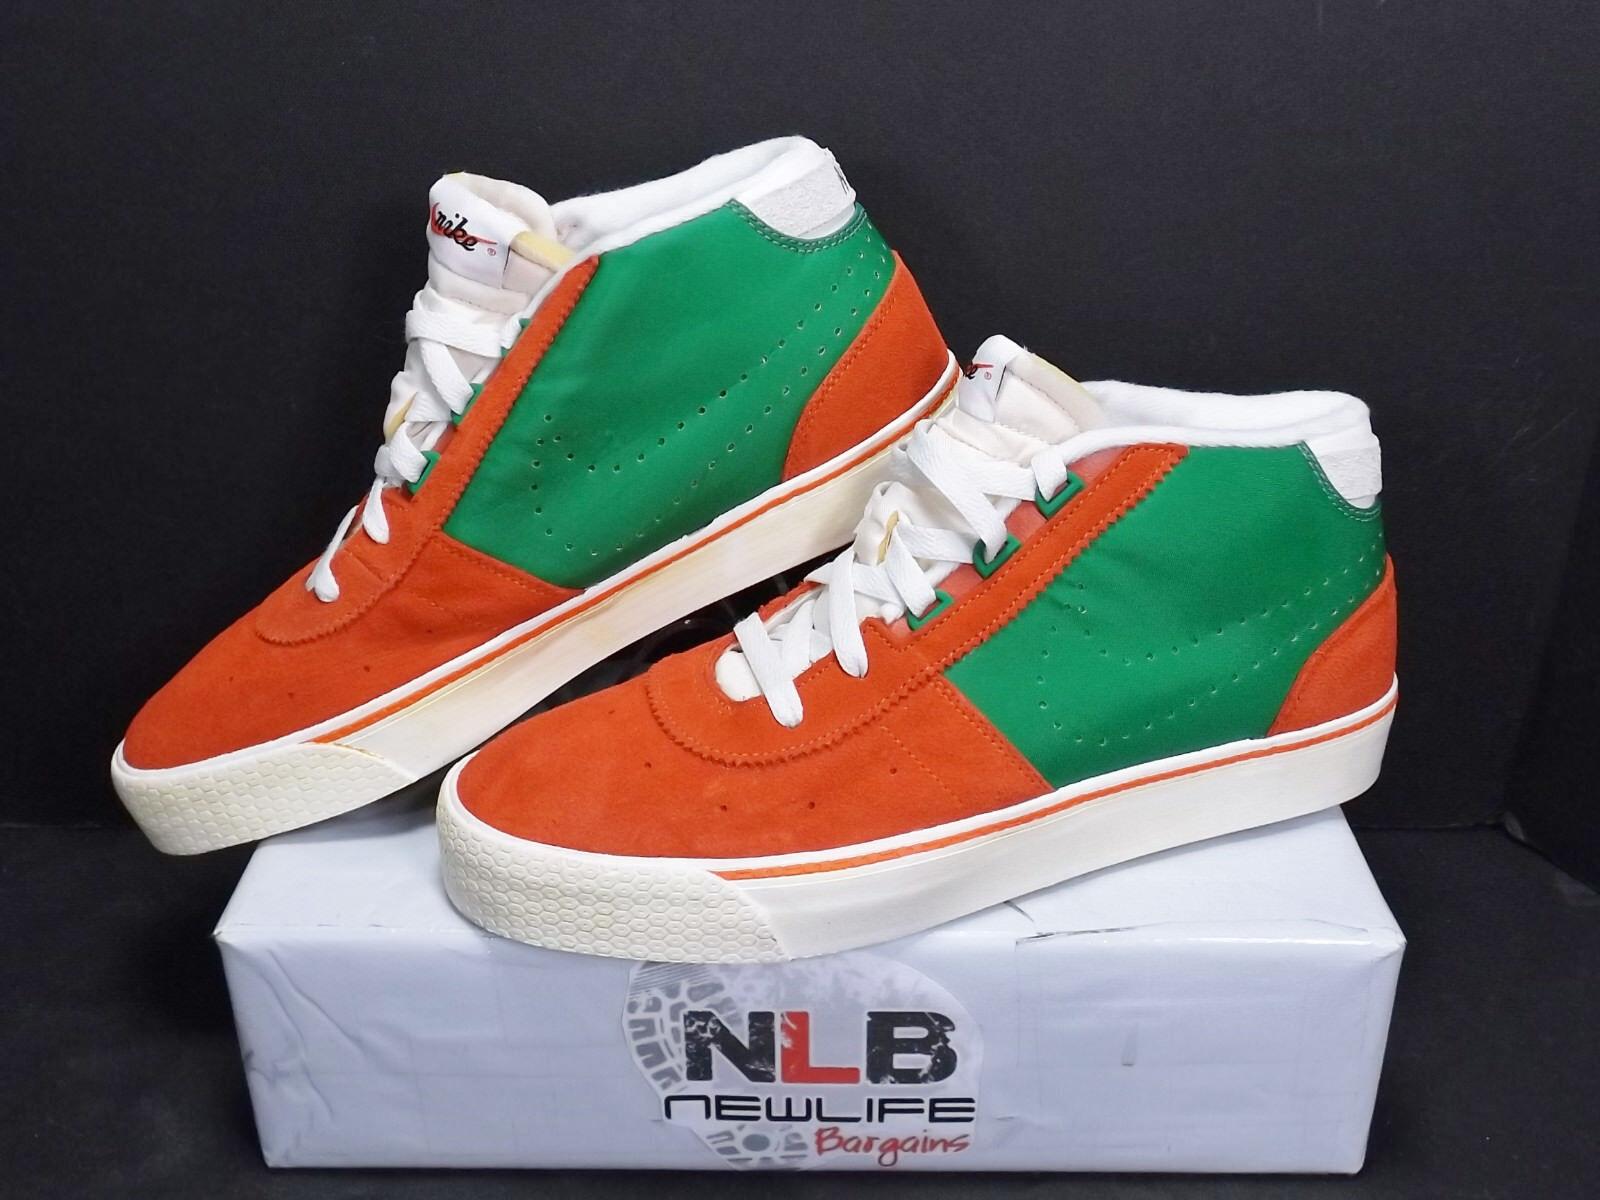 2018 Nike Hachi ND QS 457059-830 Verde equipo naranja / Victoria Verde 457059-830 hombre comodo cf8a25